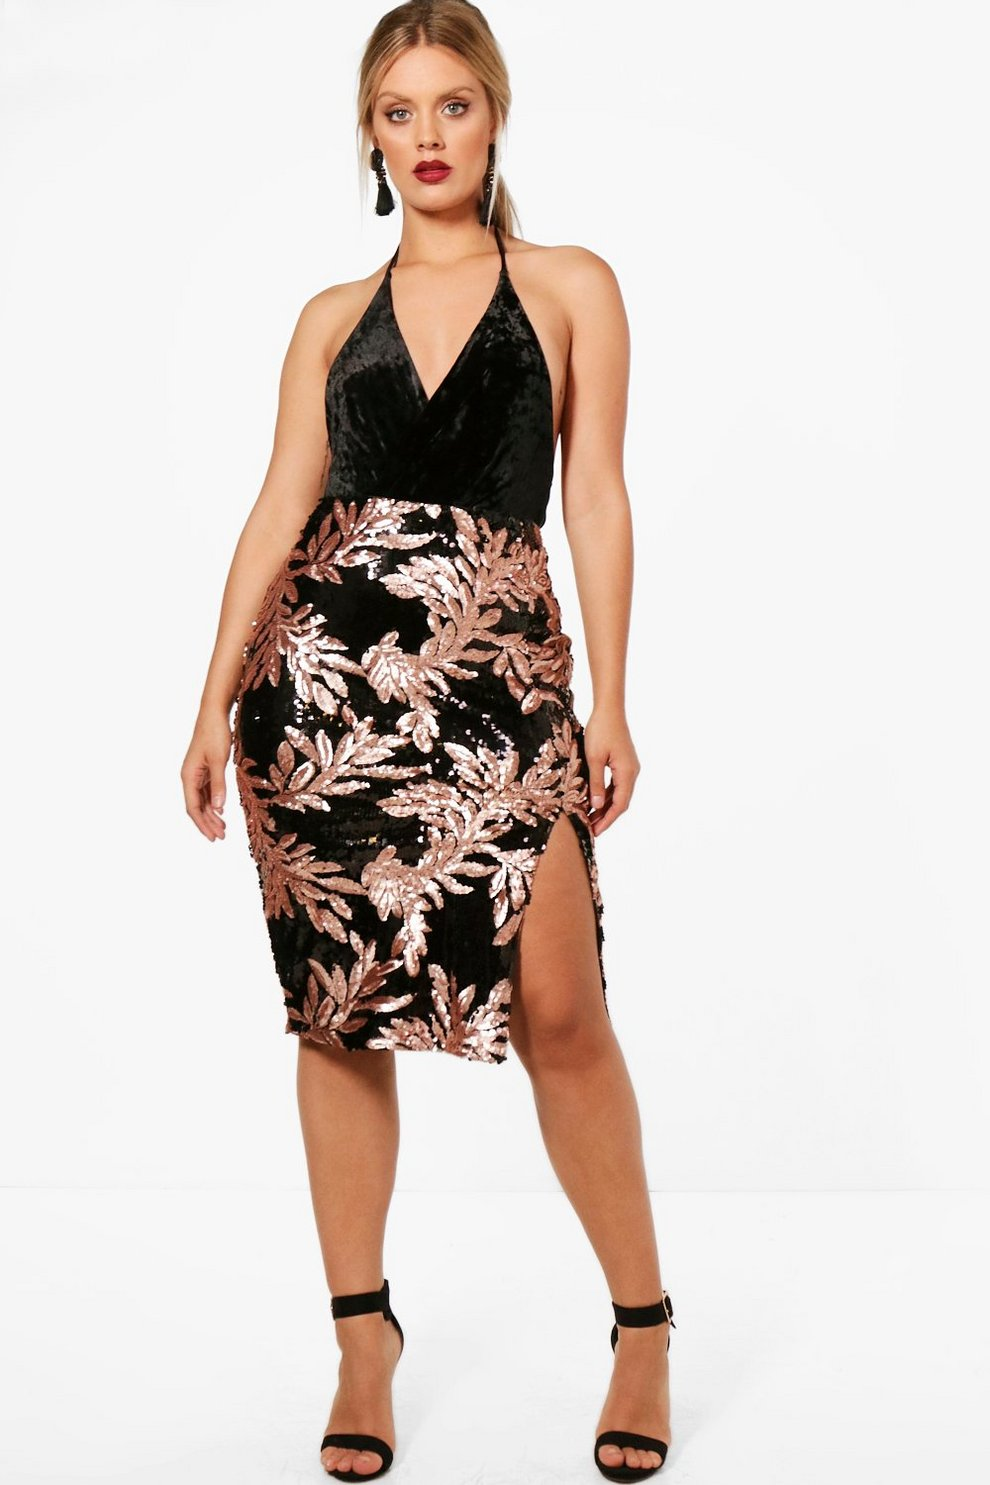 Boohoo Plus Floral Sequin Thigh Split Midi Skirt Buy Cheap Price U8fd2JUb